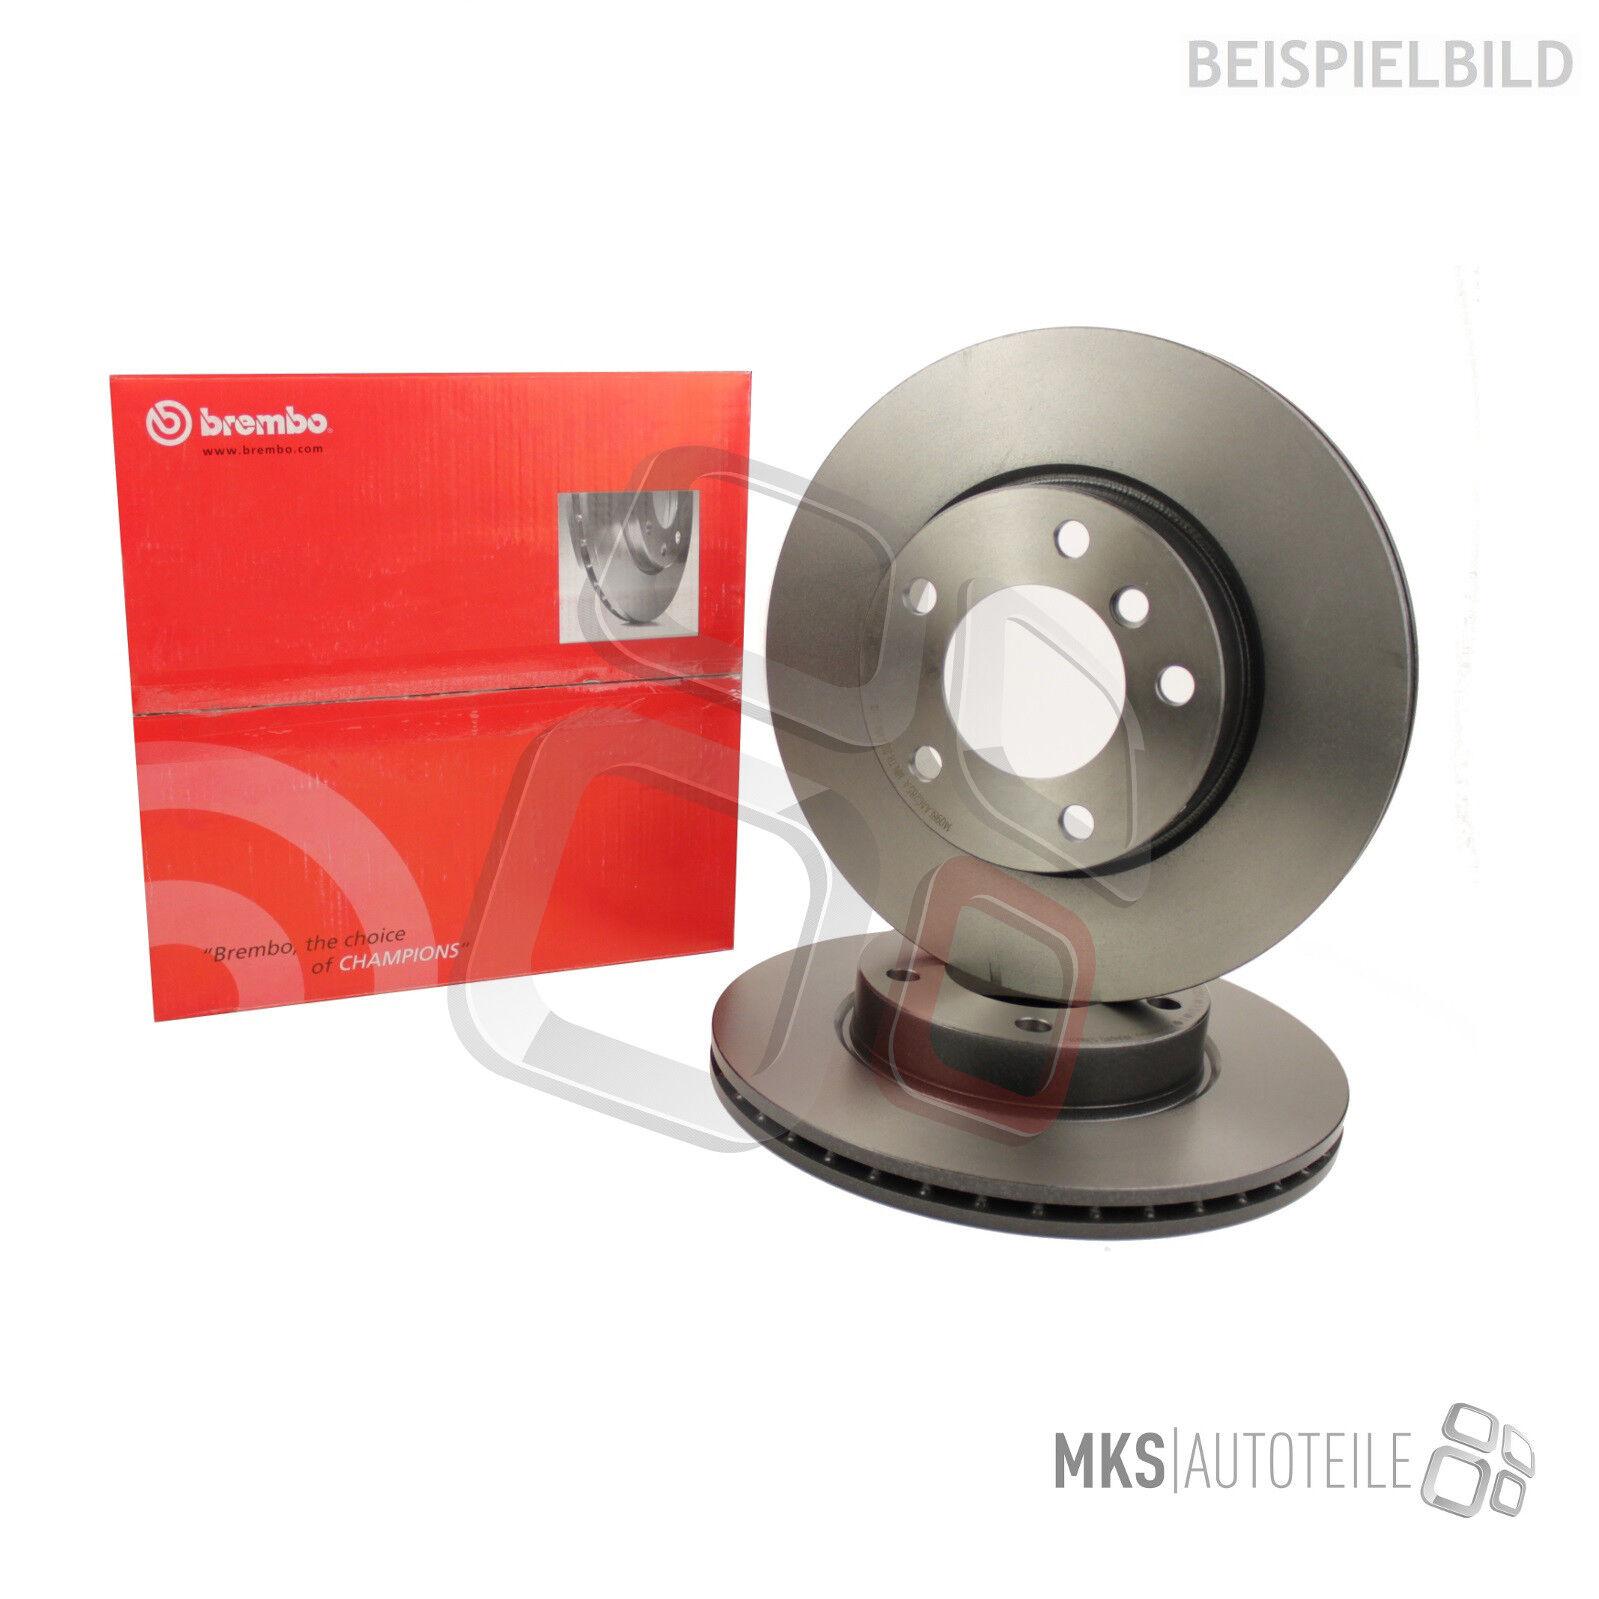 febi bilstein 23117 disco freno posteriore MINI - set di 2 dischi